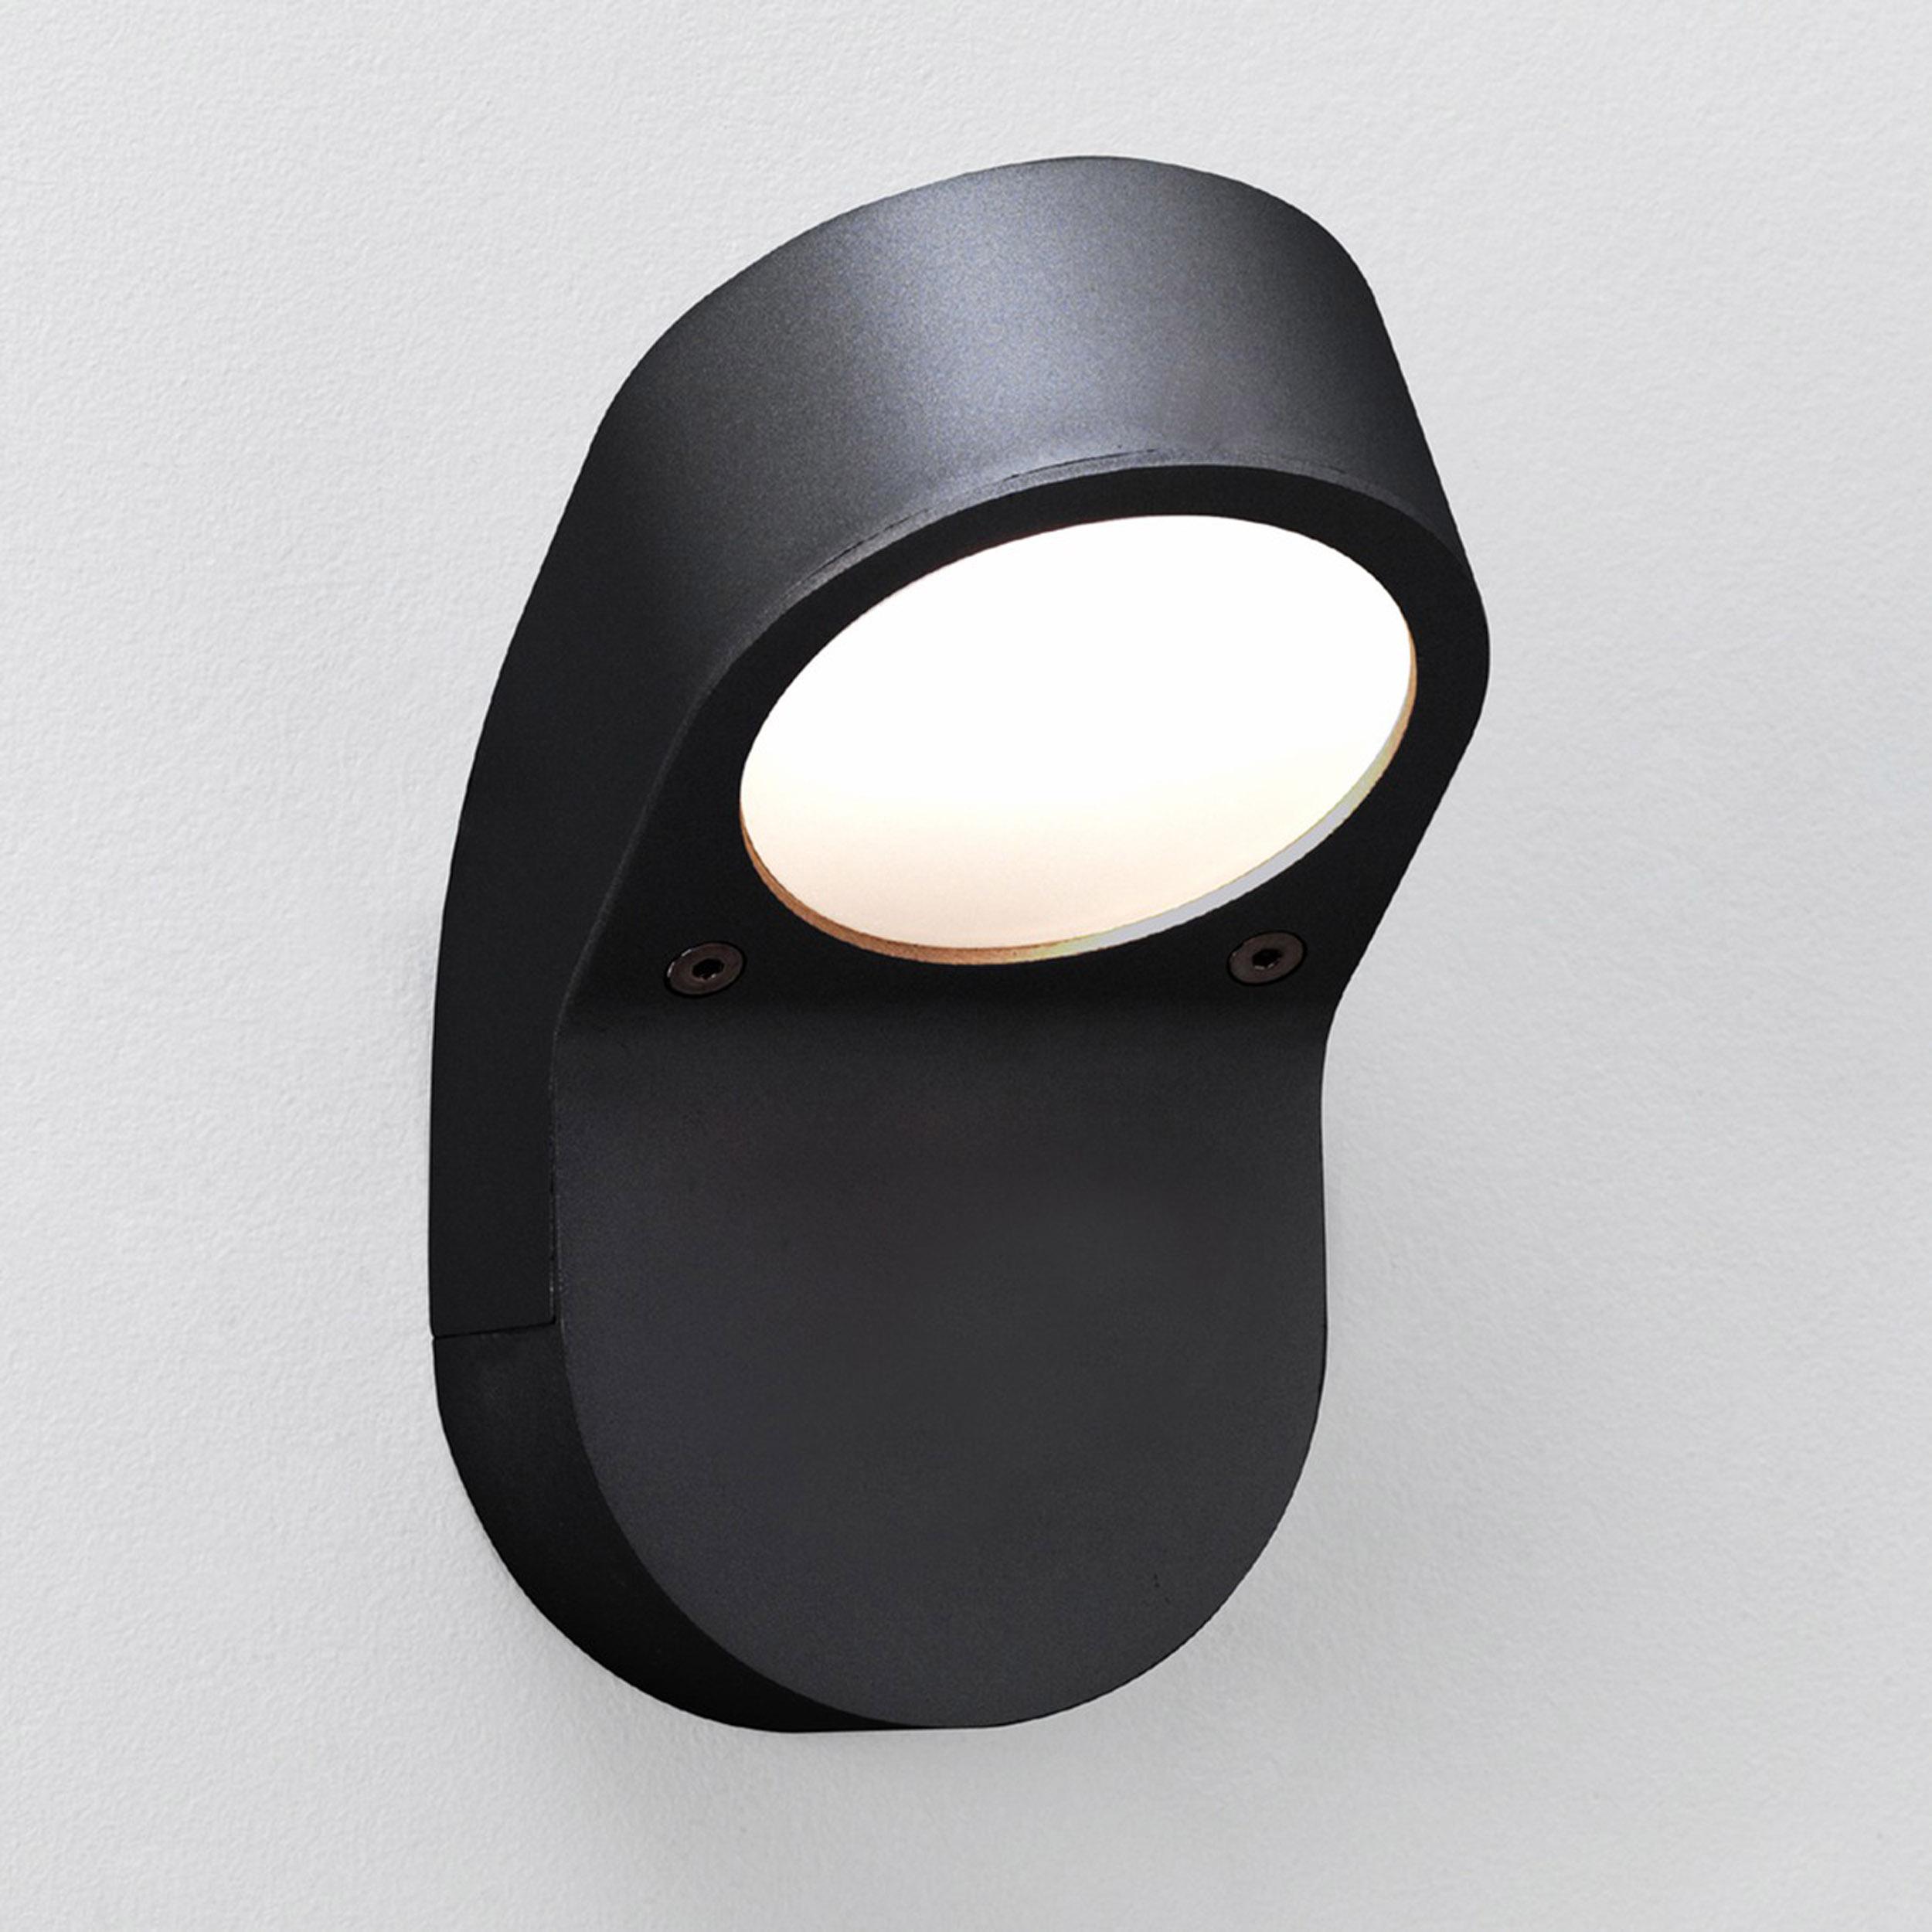 Astro Soprano Wall Light Black